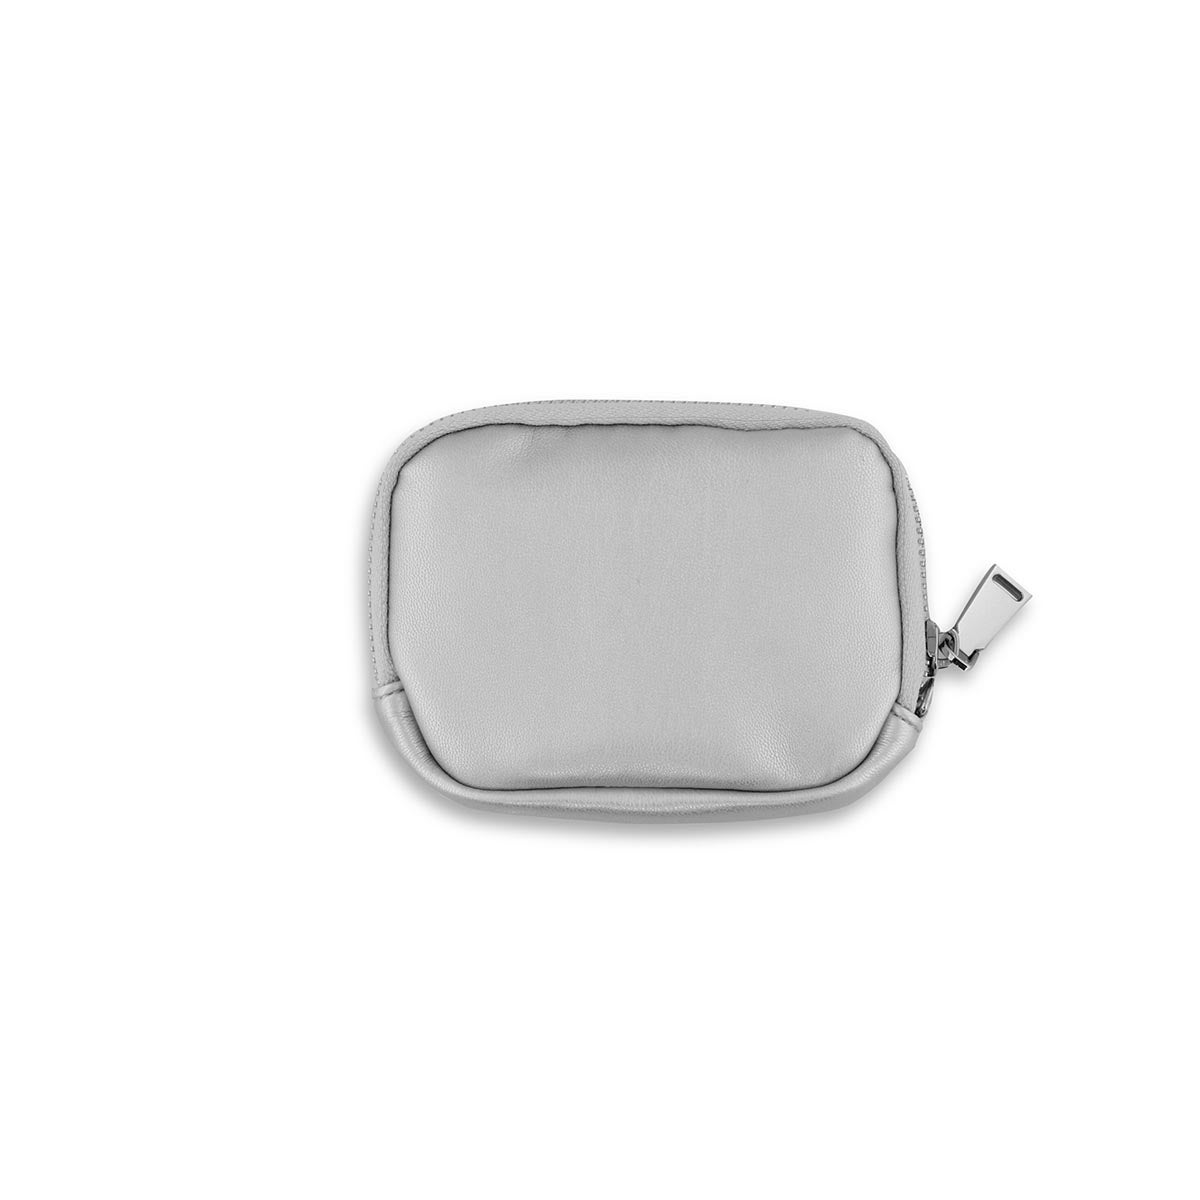 Lds silver zip up wallet